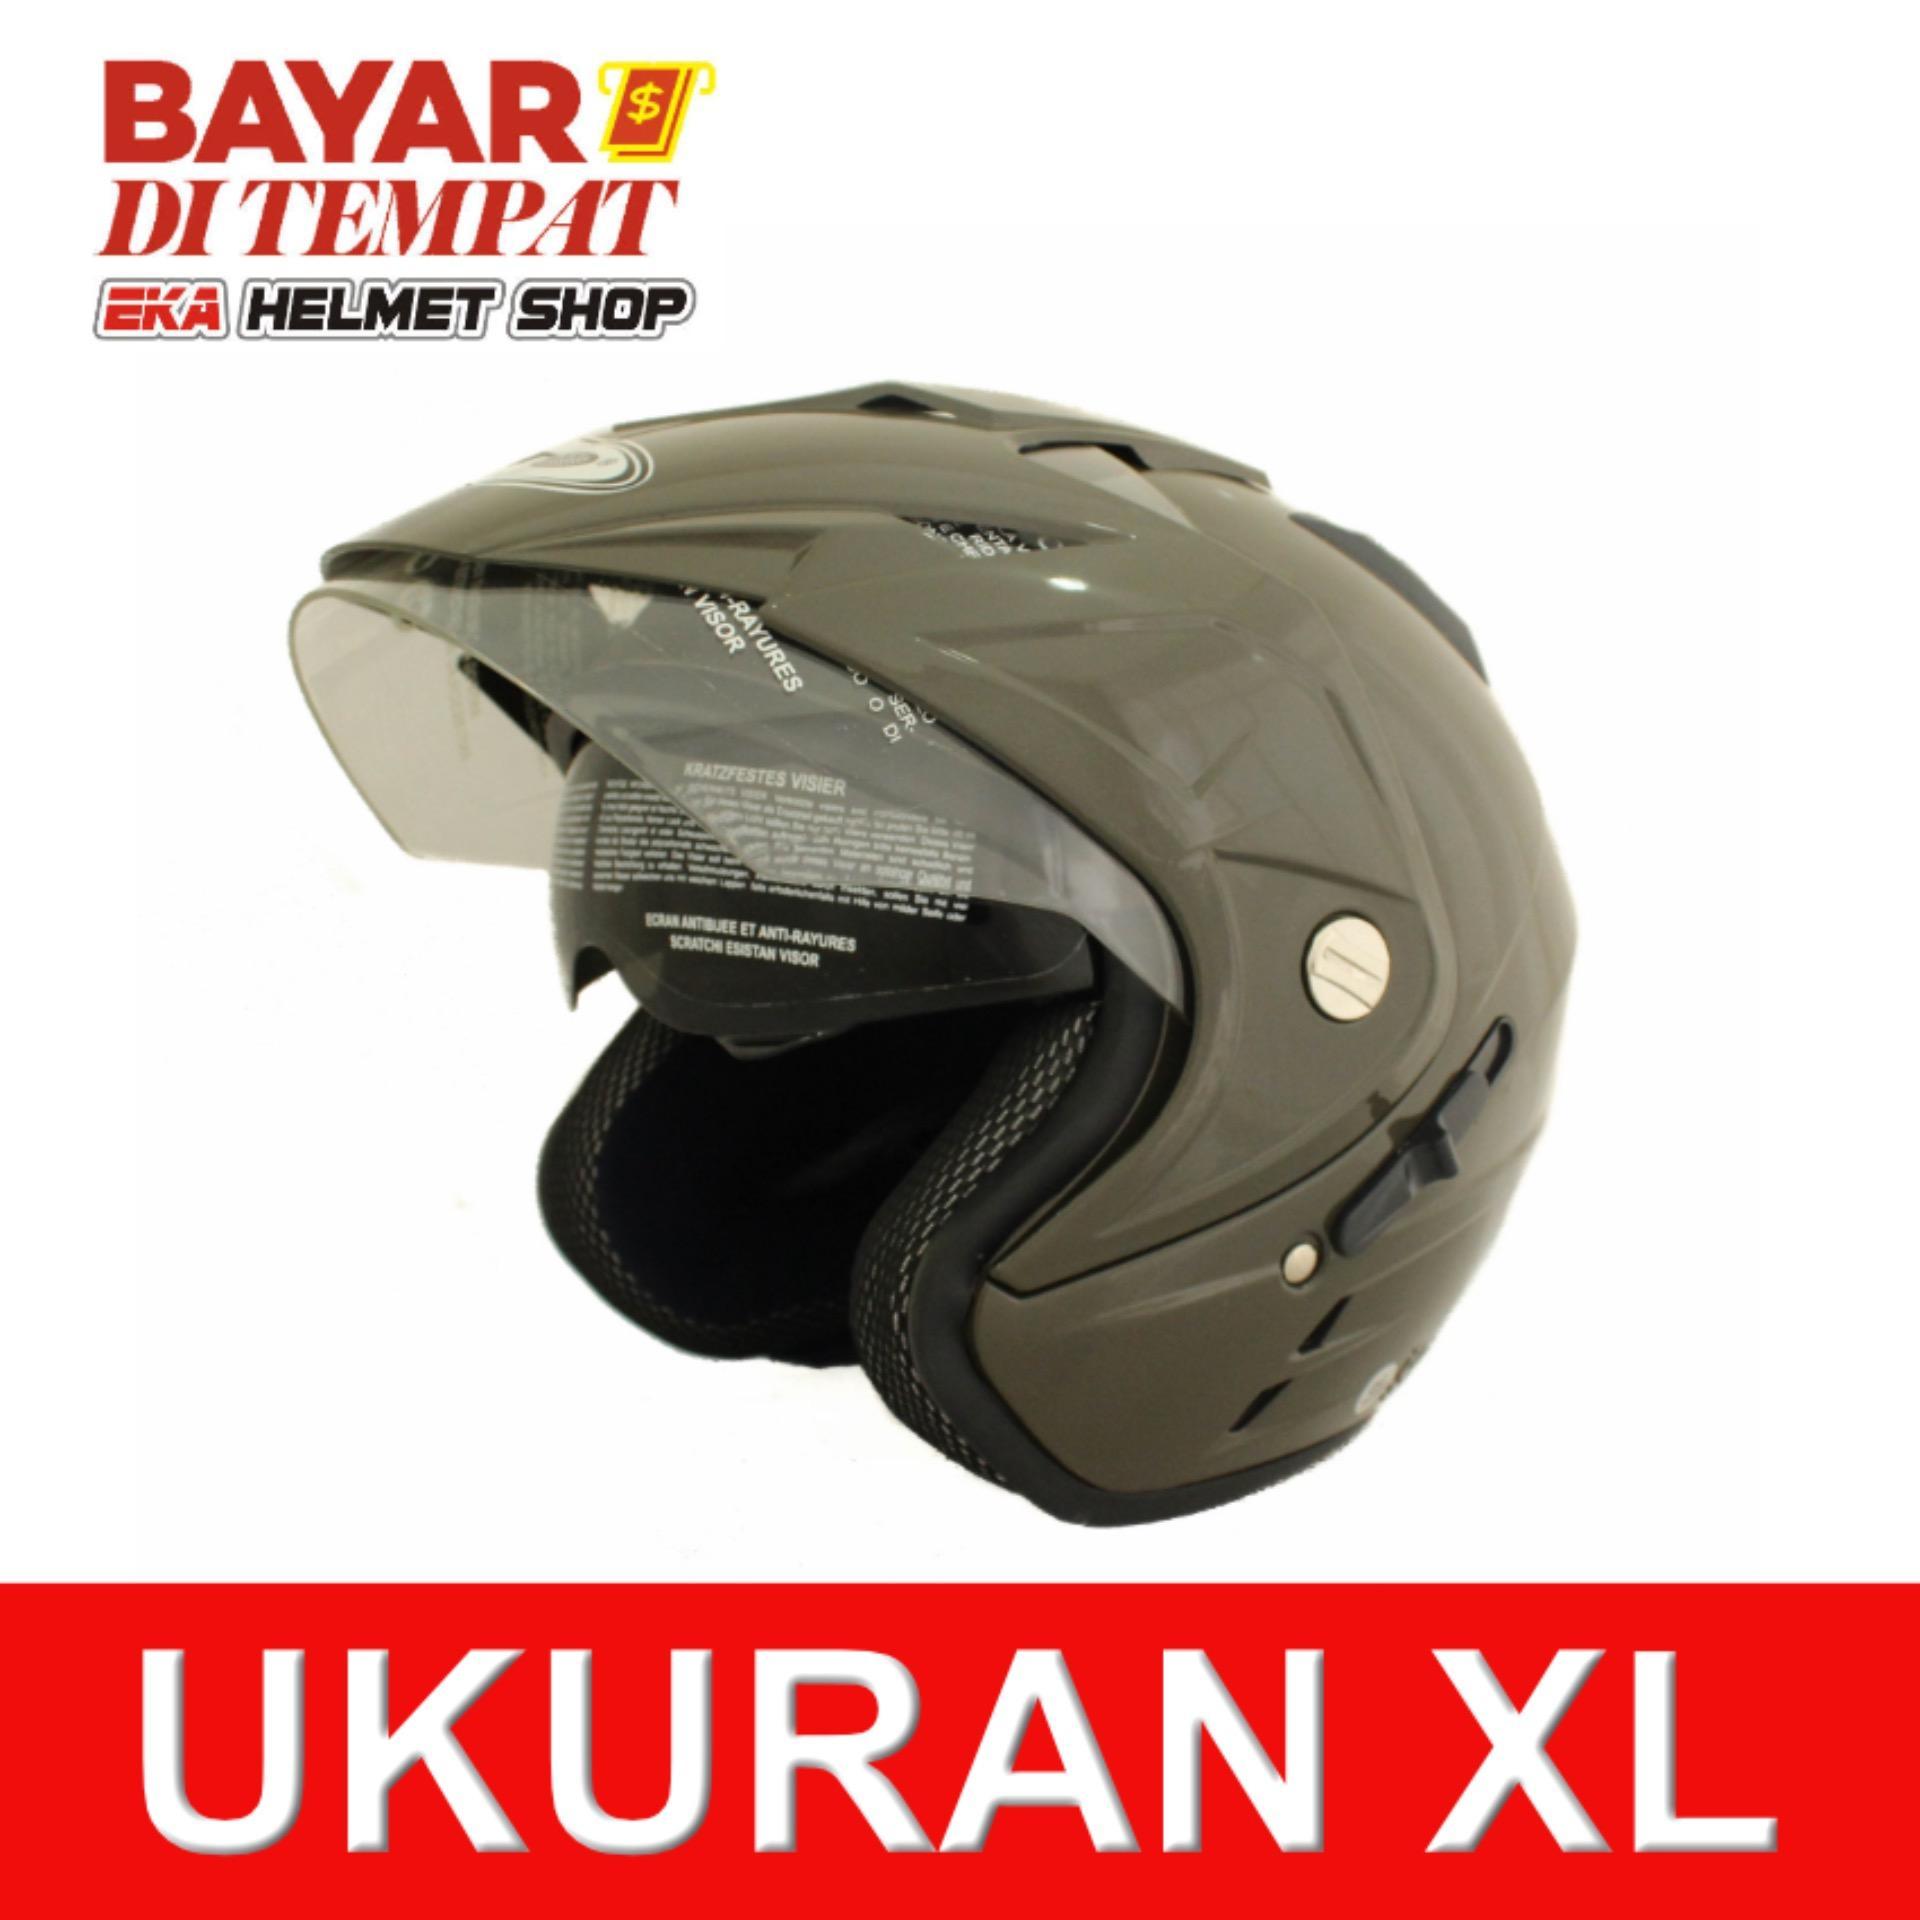 Wto Helmet Impressive Hijau Tua Di Banten